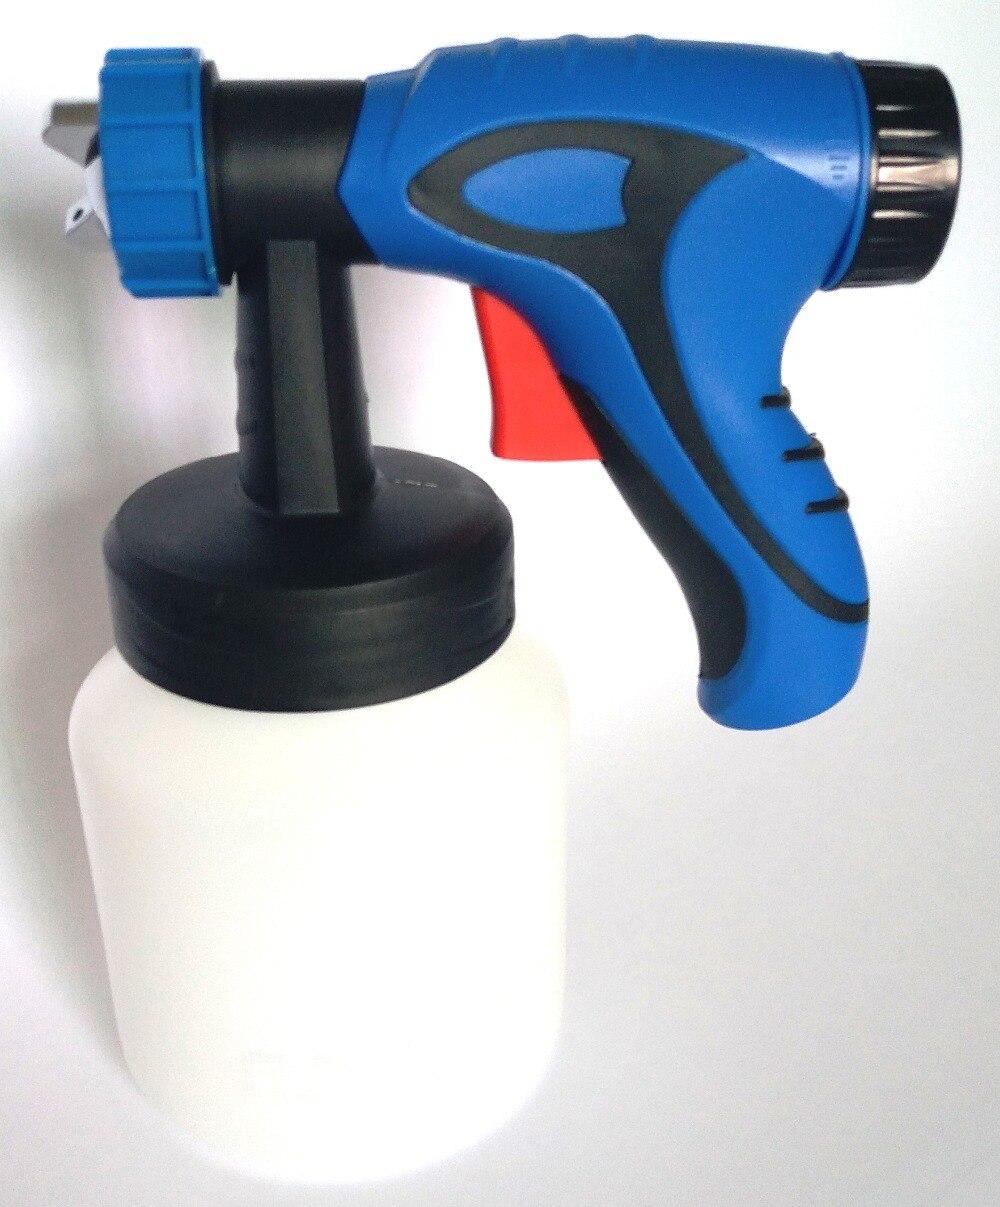 650 watt airbrush mit kompressor airless farbe sprayer hvlp lvlp